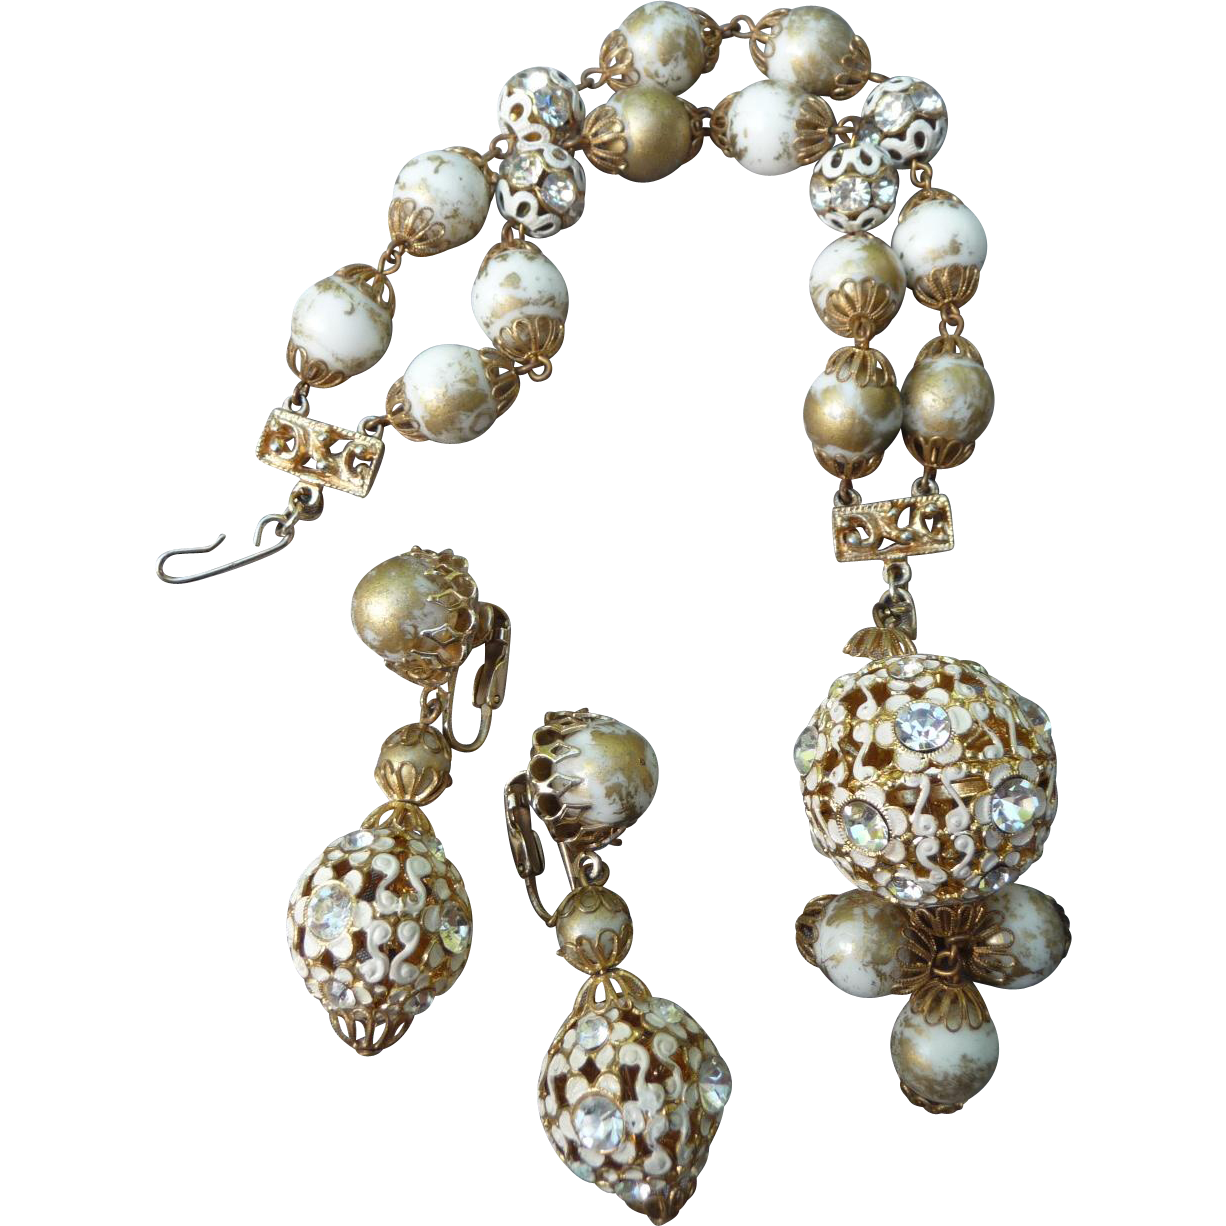 Fantastic Vintage Hobe Bracelet and Earrings